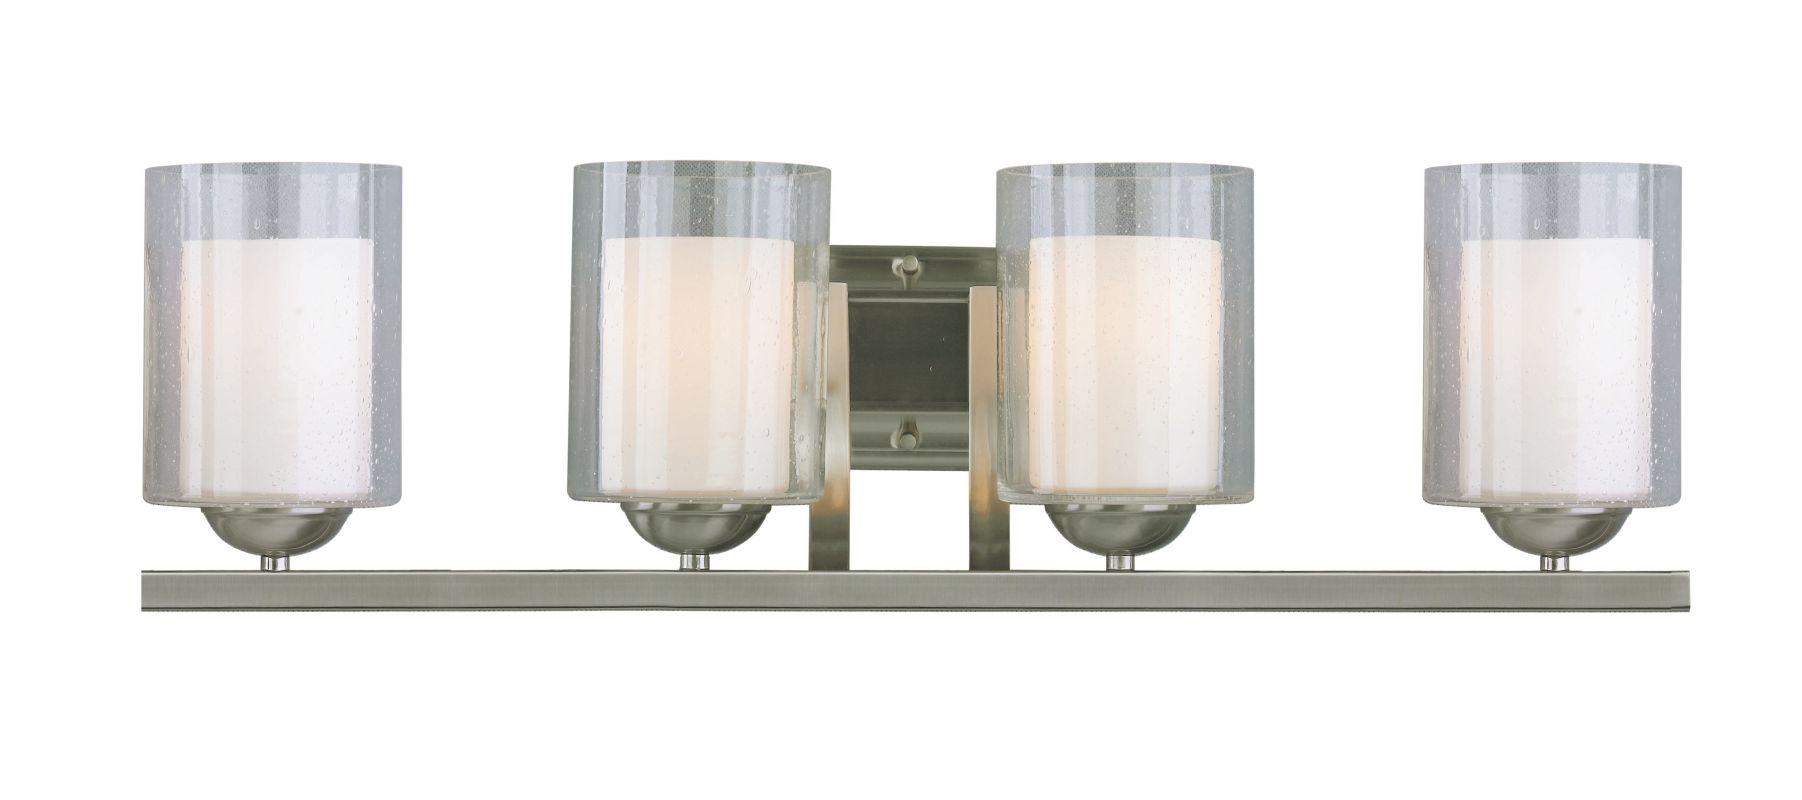 Woodbridge Lighting 53114 Cosmo 4 Light Vanity Light Satin Nickel